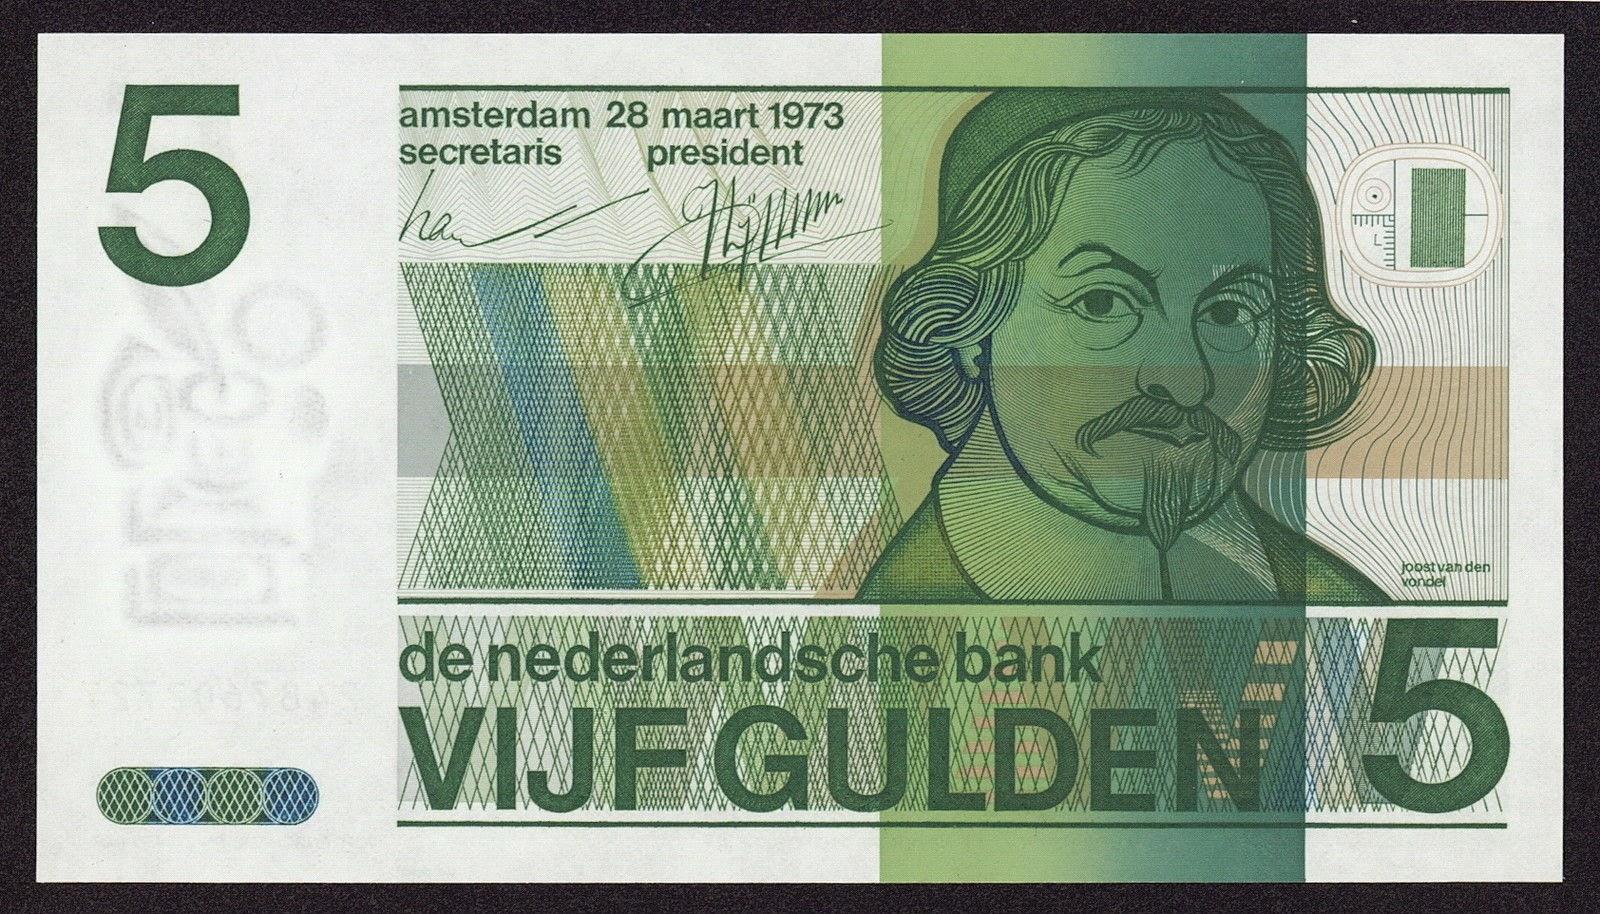 Netherlands Banknotes 5 Gulden Banknote 1973 Joost van den Vondel